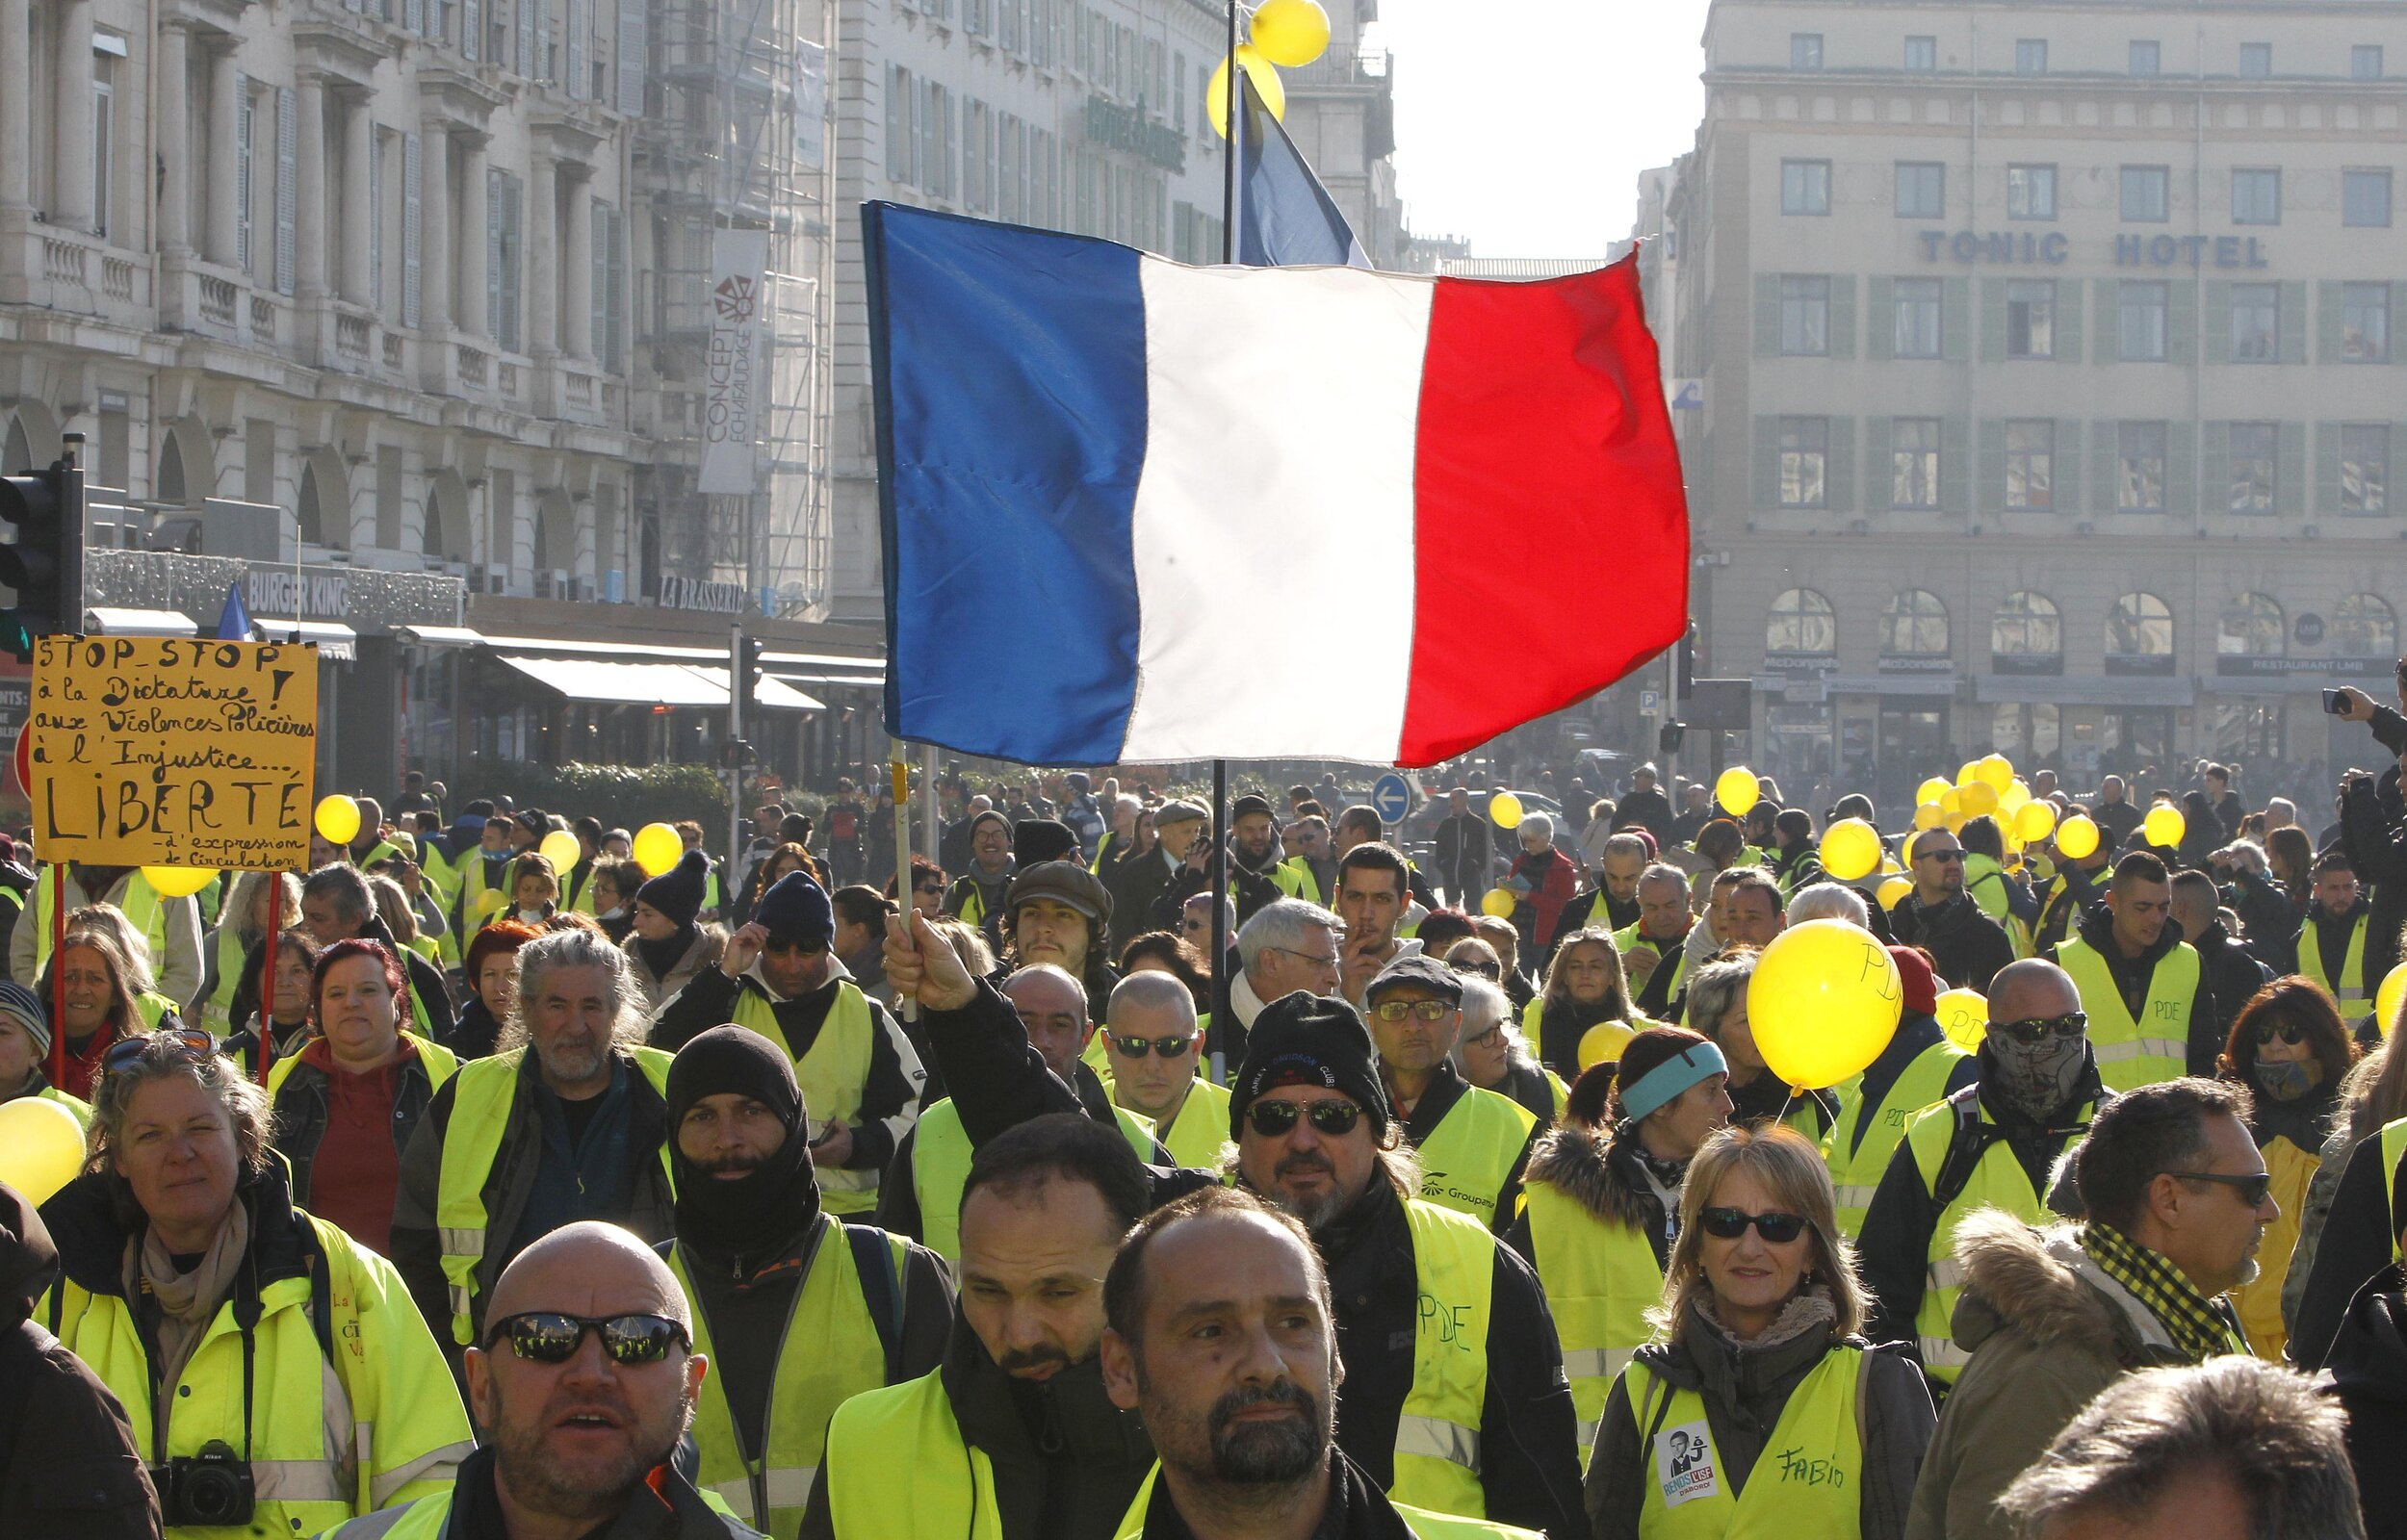 Gilets Jaunes Protests